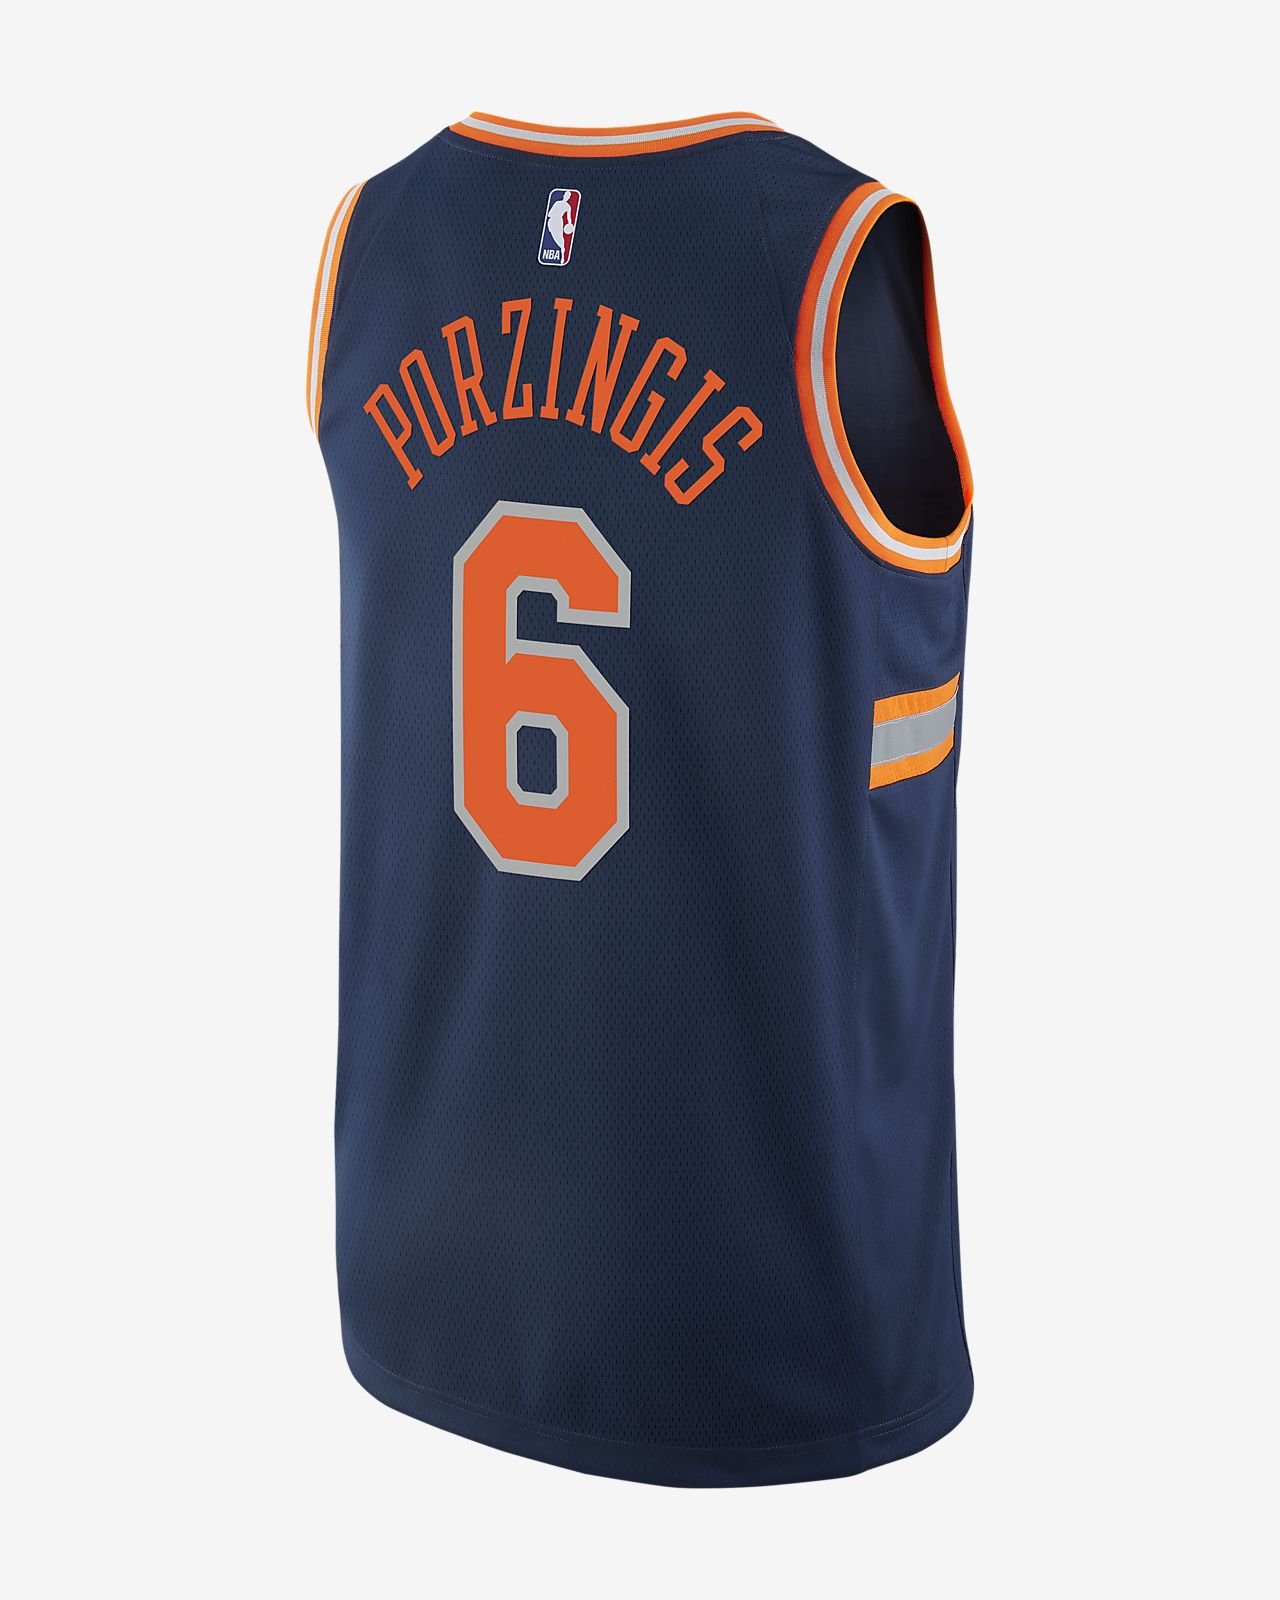 ee3b3bfcf102 ... kristaps porzingis city edition swingman jersey (new york knicks) mens nike  nba jersey